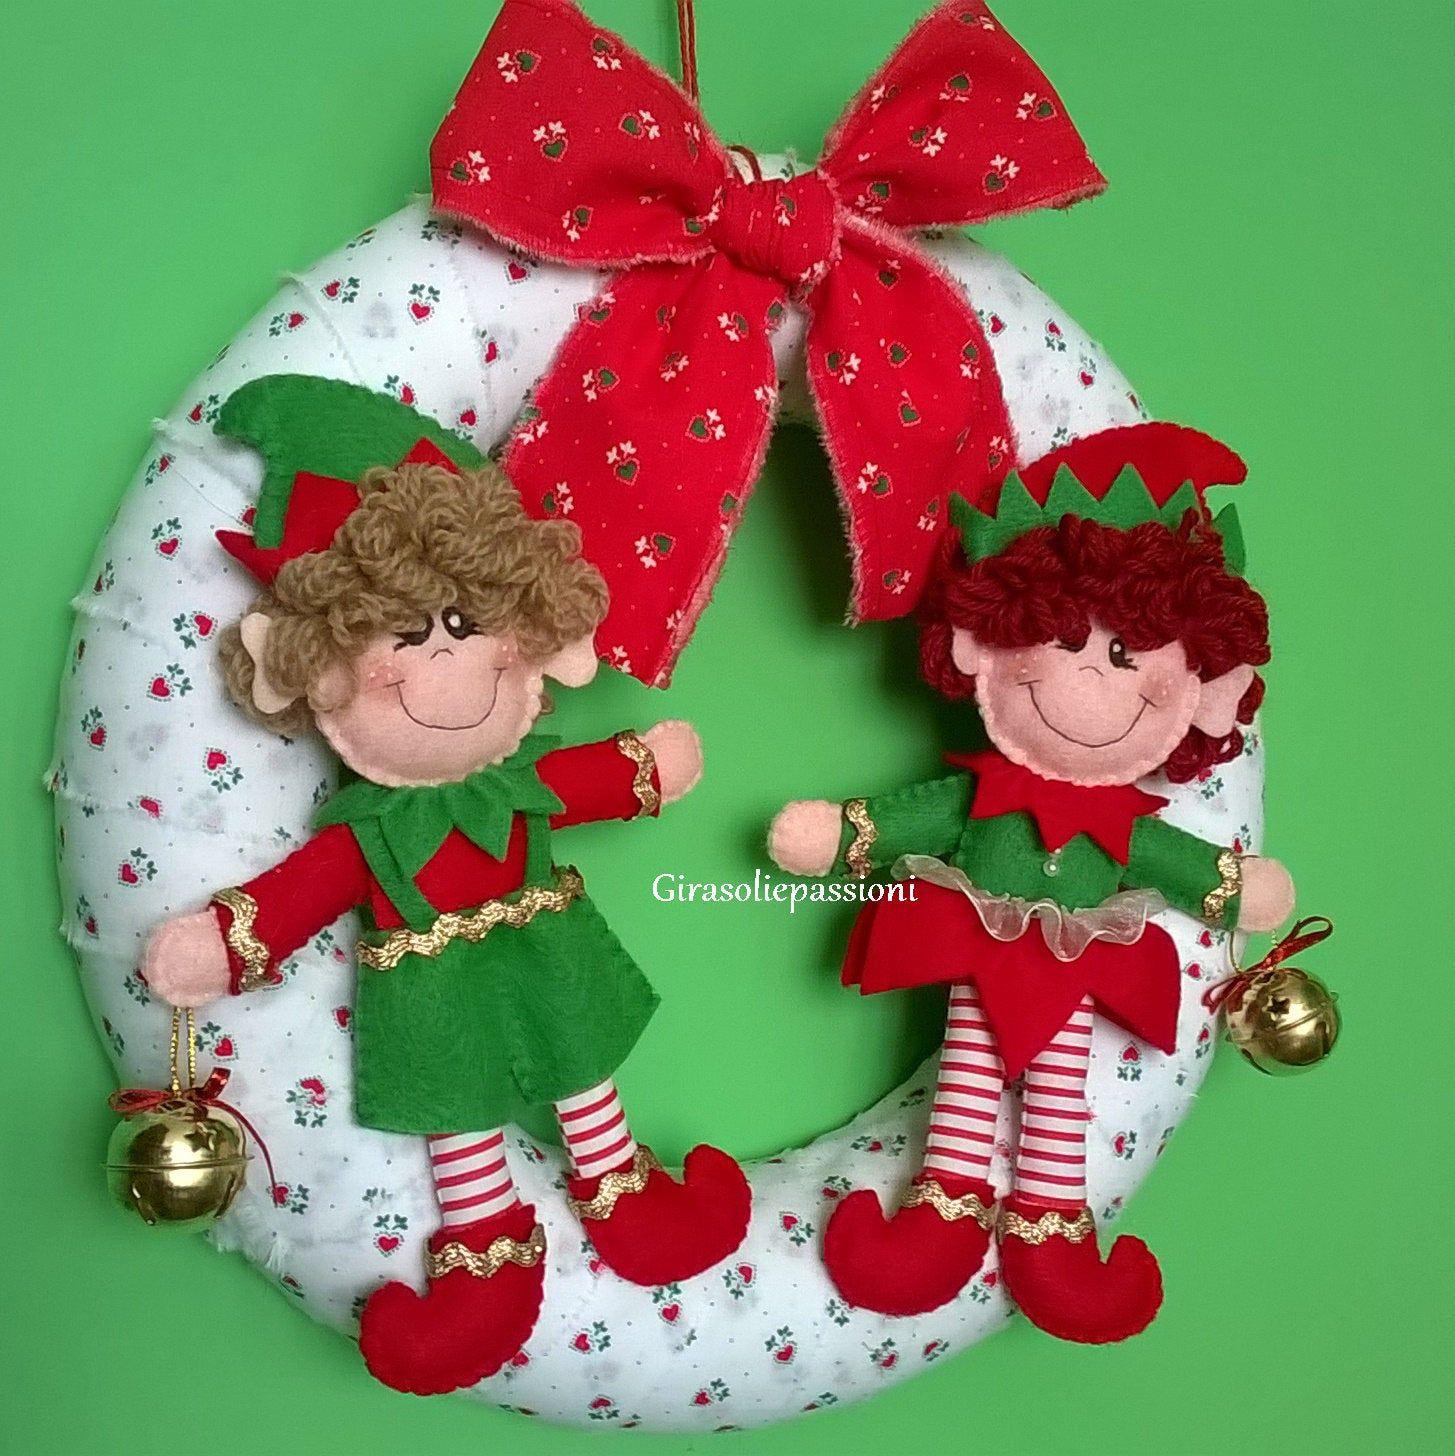 Photo of Ghirlanda Natalizia, Corona natalizia con Elfi, Fuoriporta natalizio, Stile Tirolese, Stile Moderno